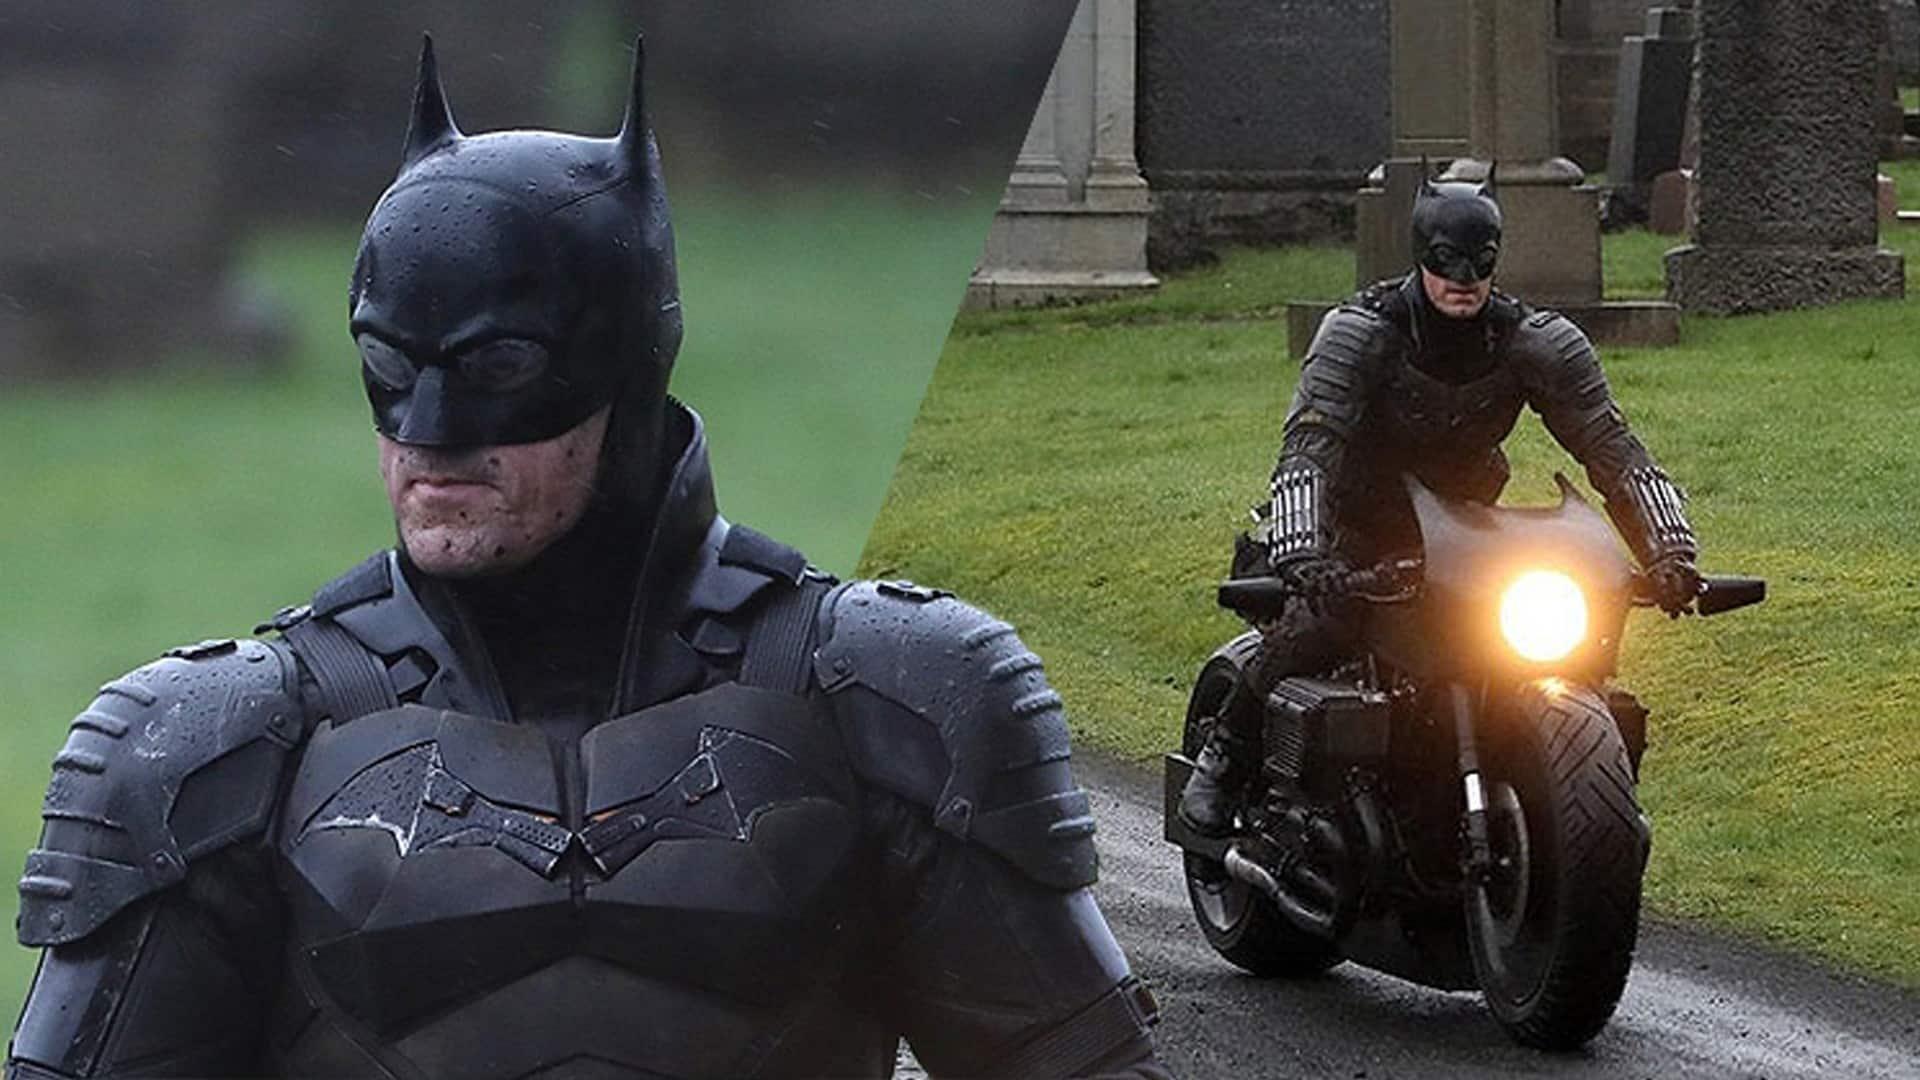 Batman Roberta Pattinsona